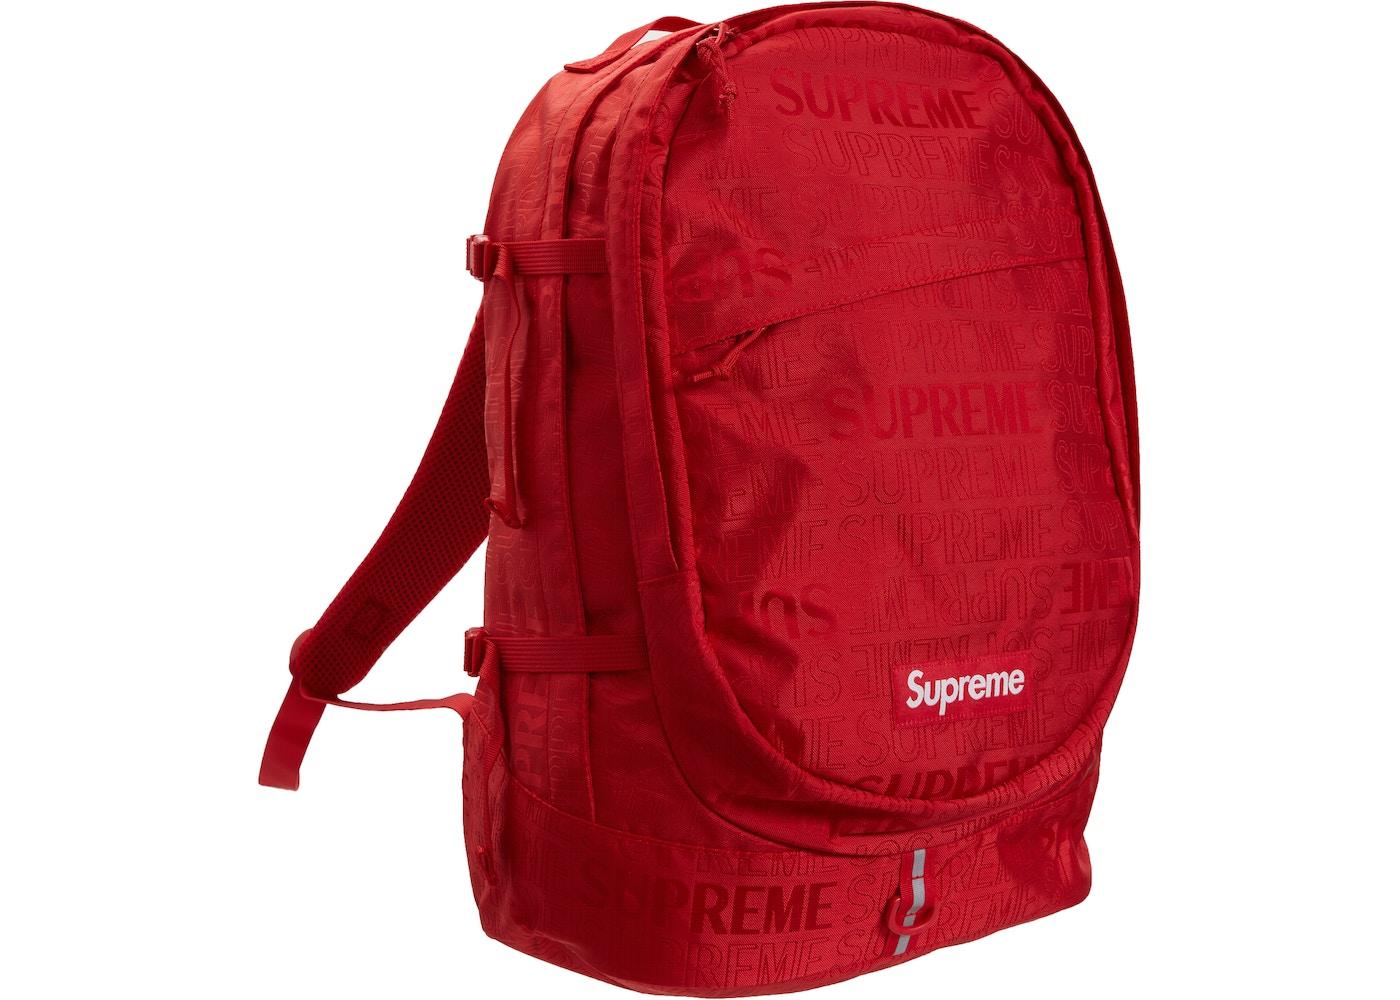 65df2dc8 Streetwear - Supreme Bags - Most Popular